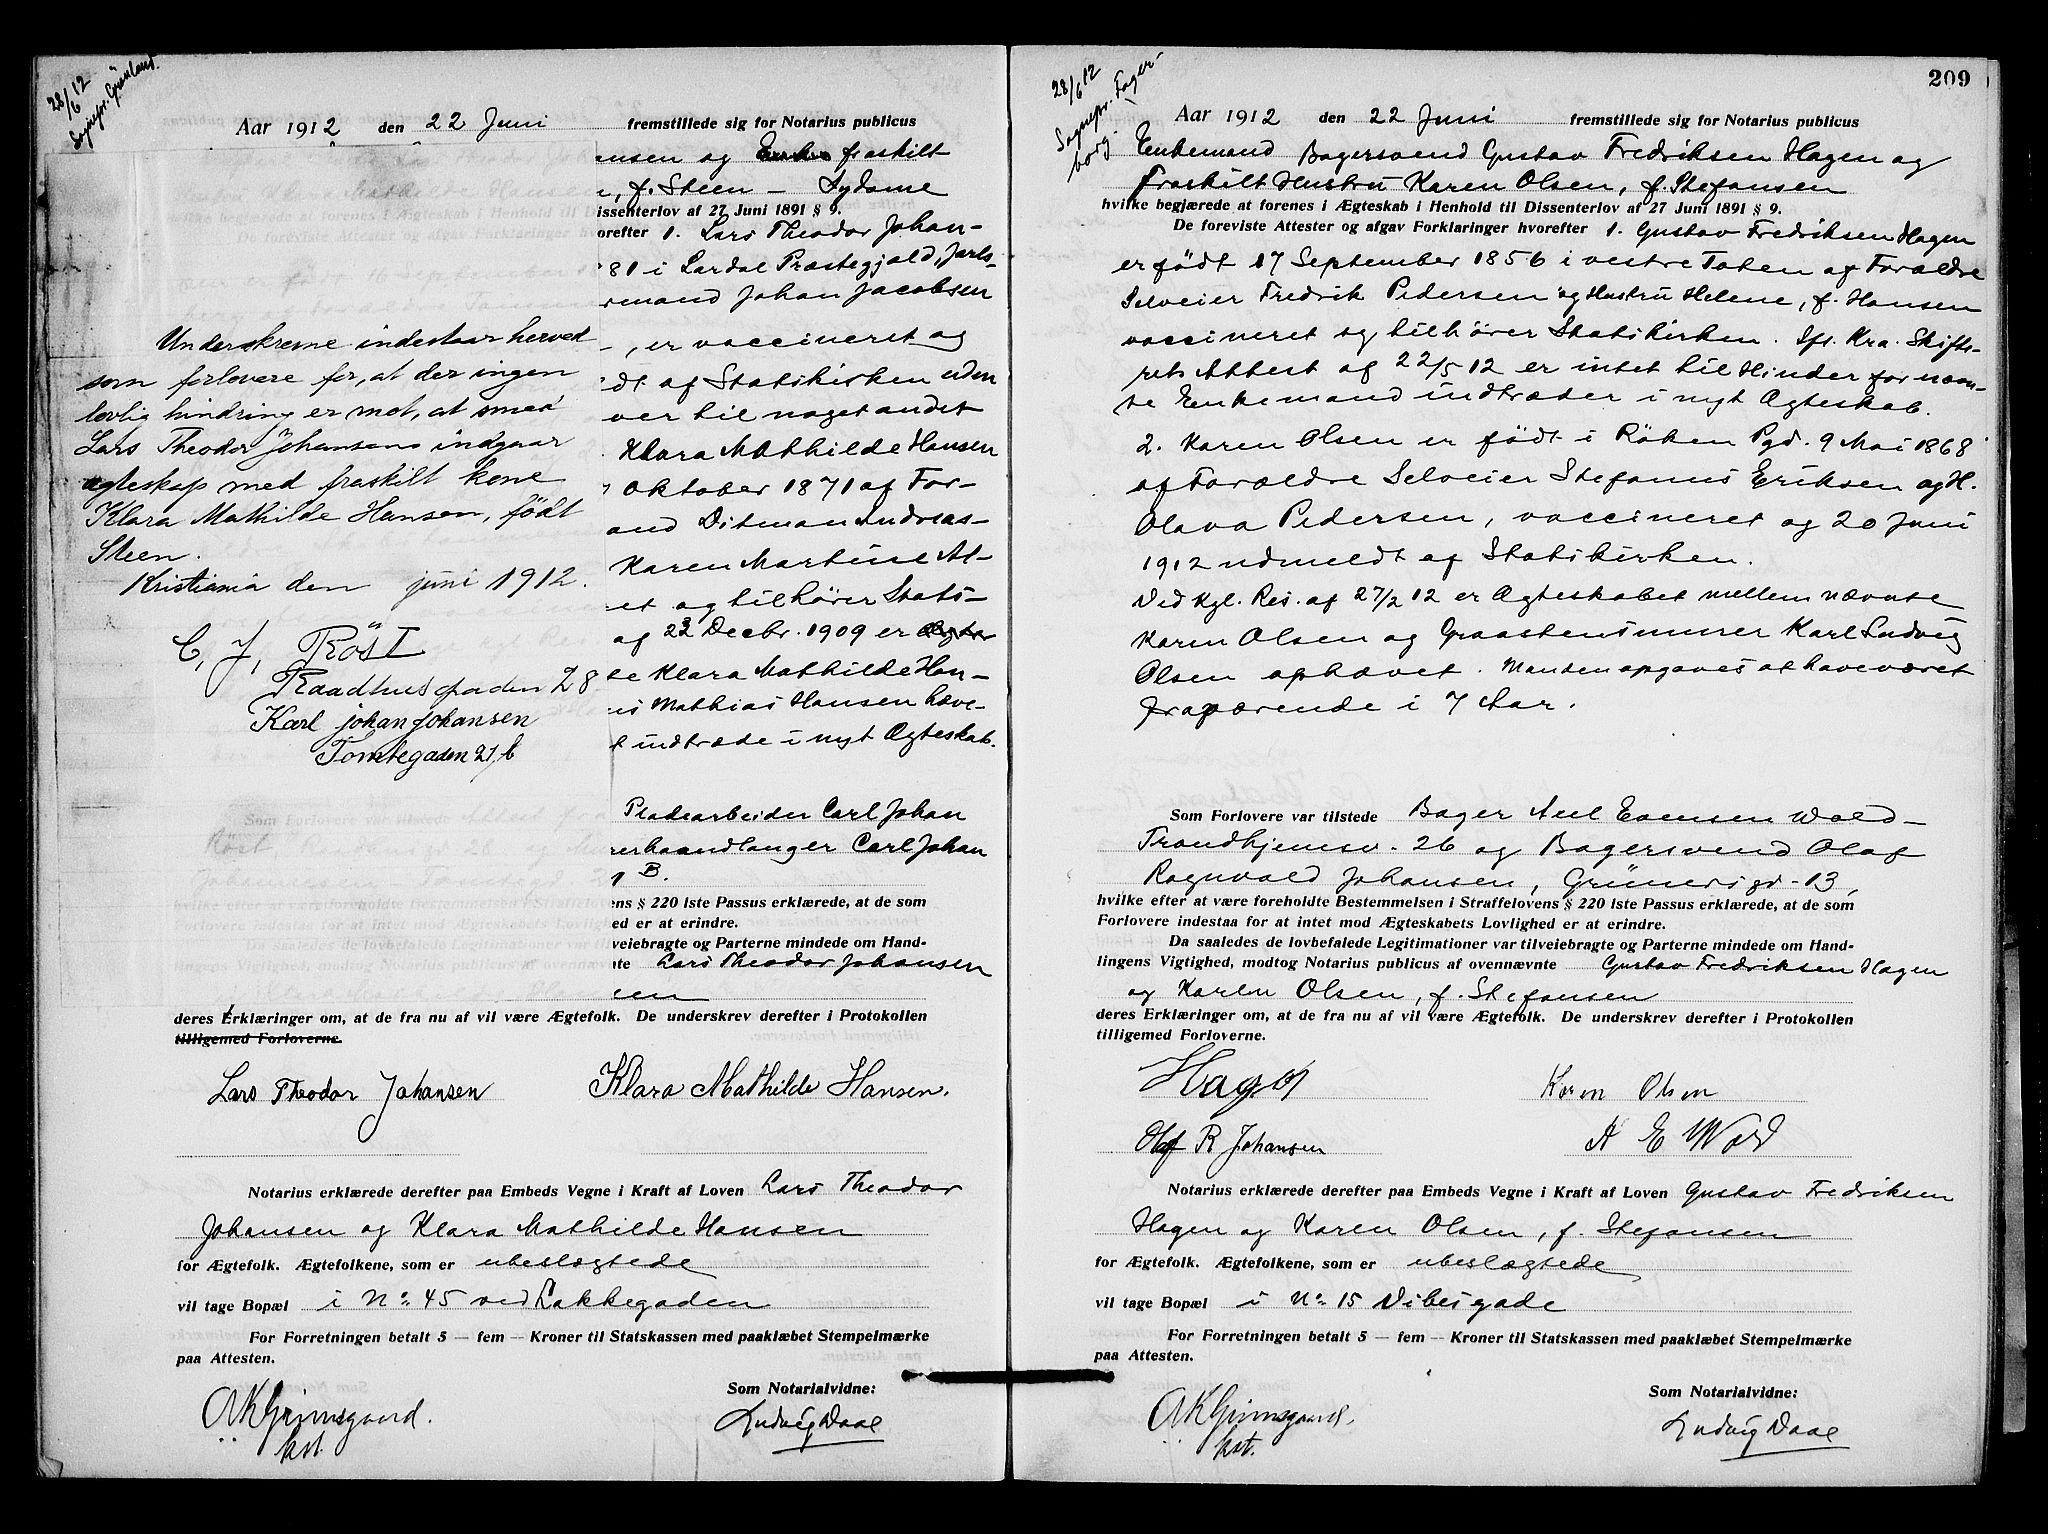 SAO, Oslo byfogd avd. I, L/Lb/Lbb/L0008: Notarialprotokoll, rekke II: Vigsler, 1911-1913, s. 208b-209a